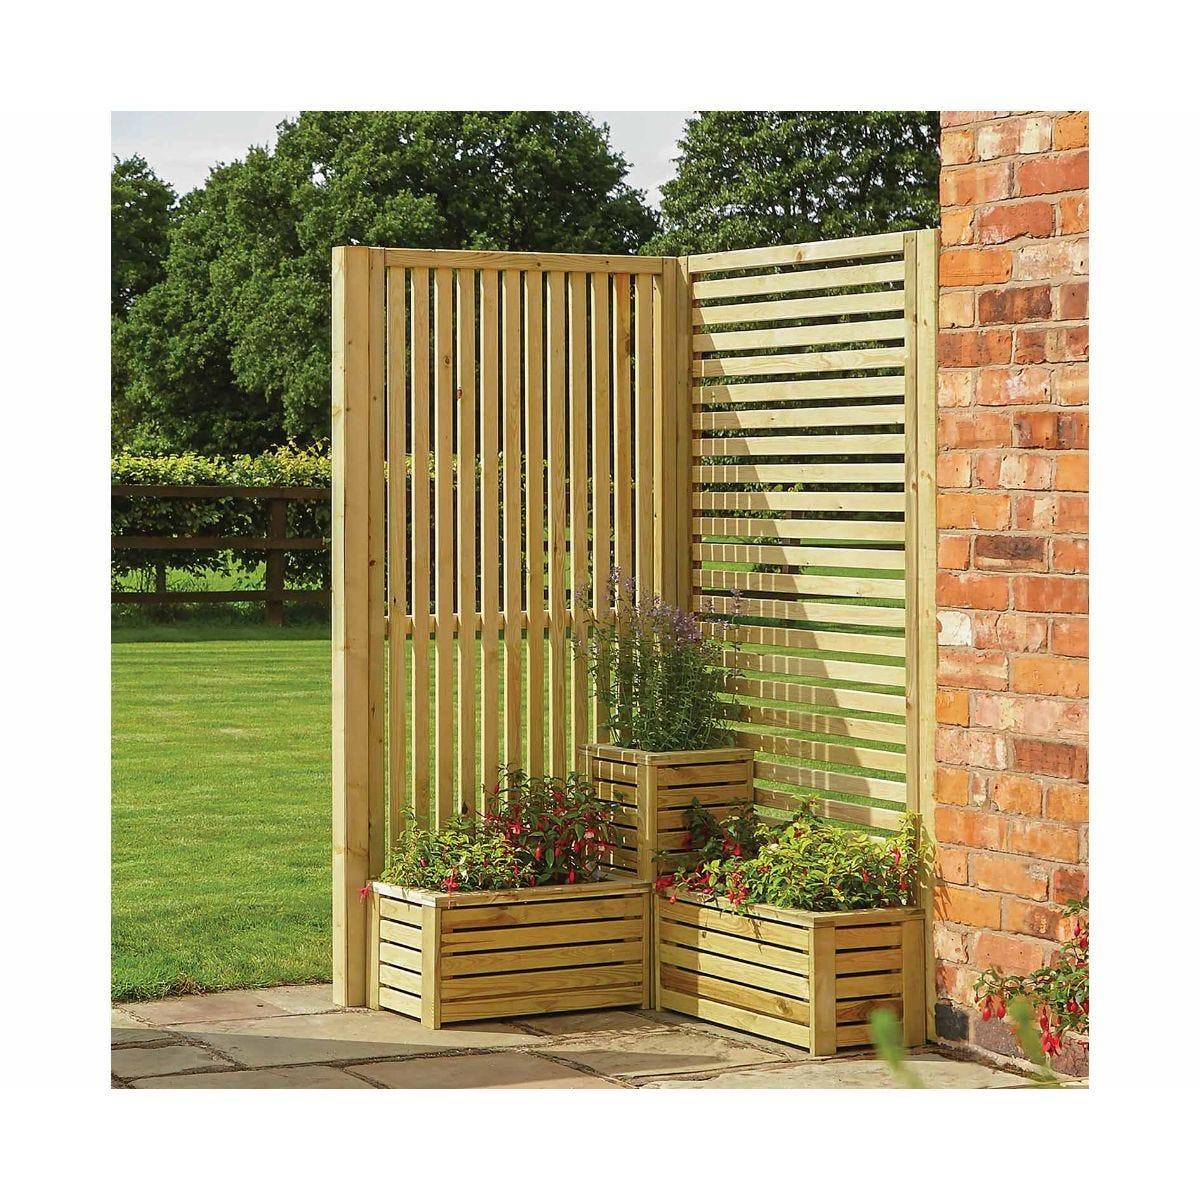 Rowlinson Garden Creations Corner Screen and Planter Set, Natural